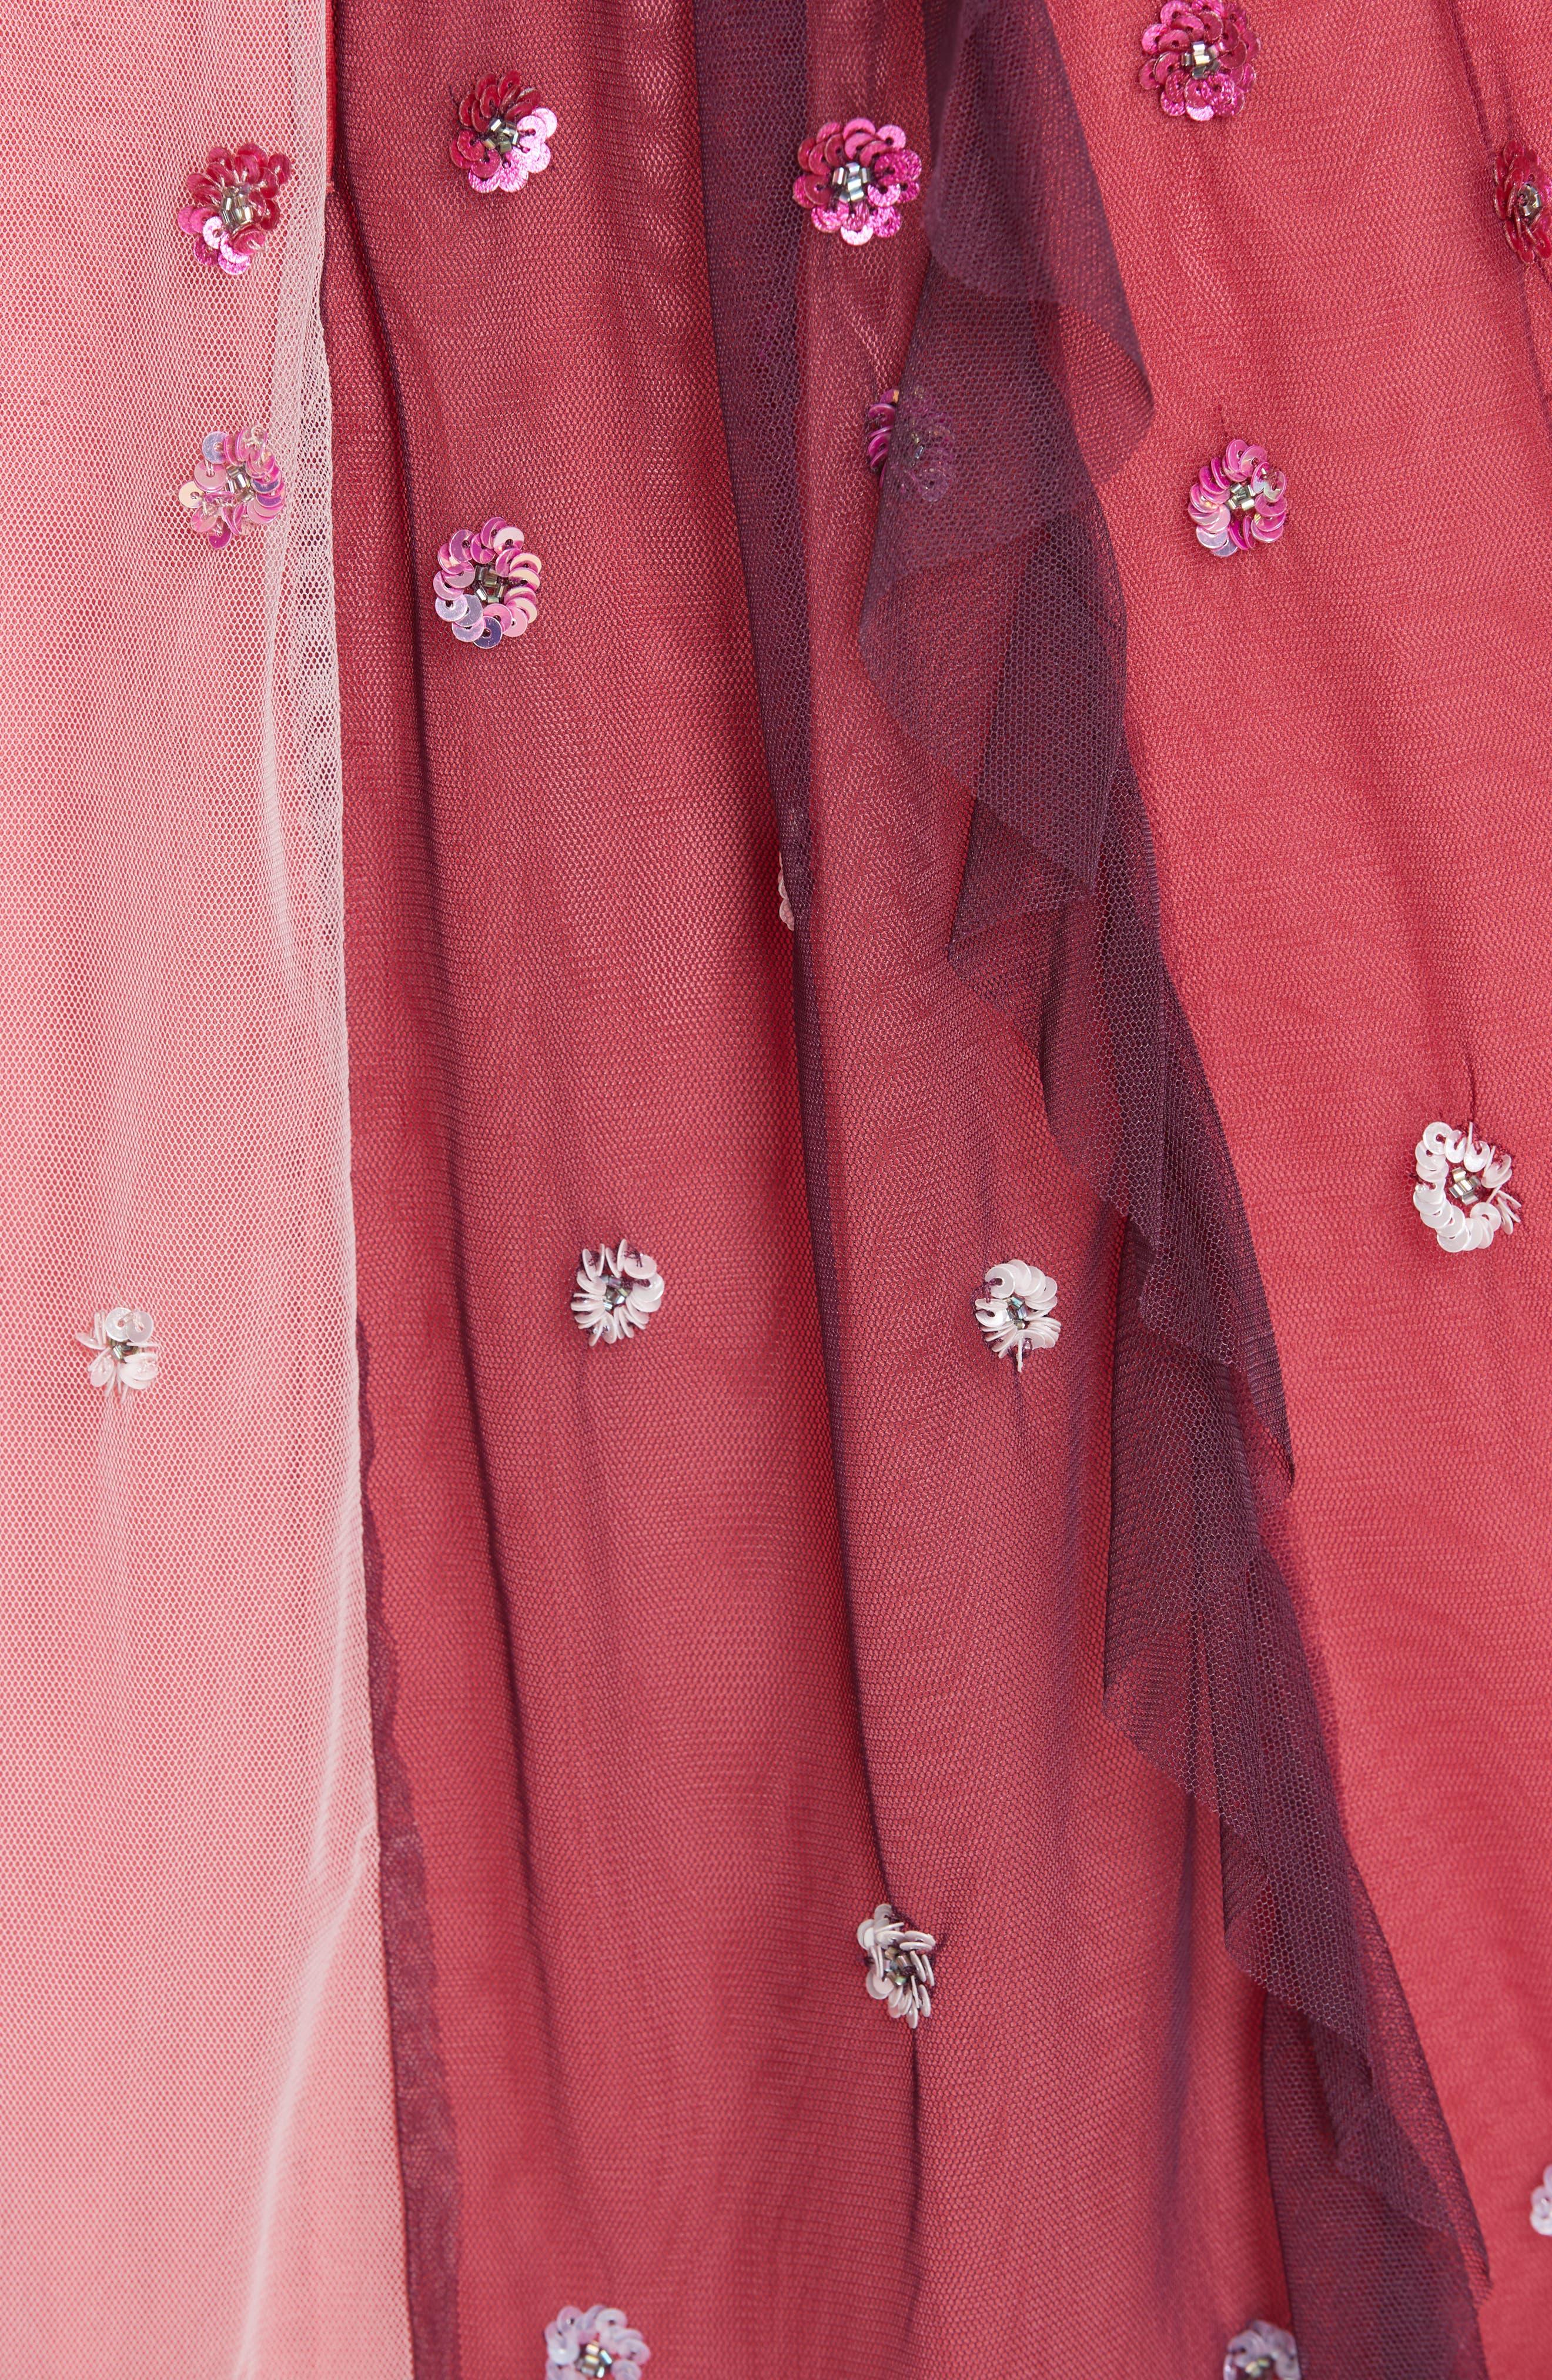 Rainbow Midi Skirt,                             Alternate thumbnail 5, color,                             CHERRY